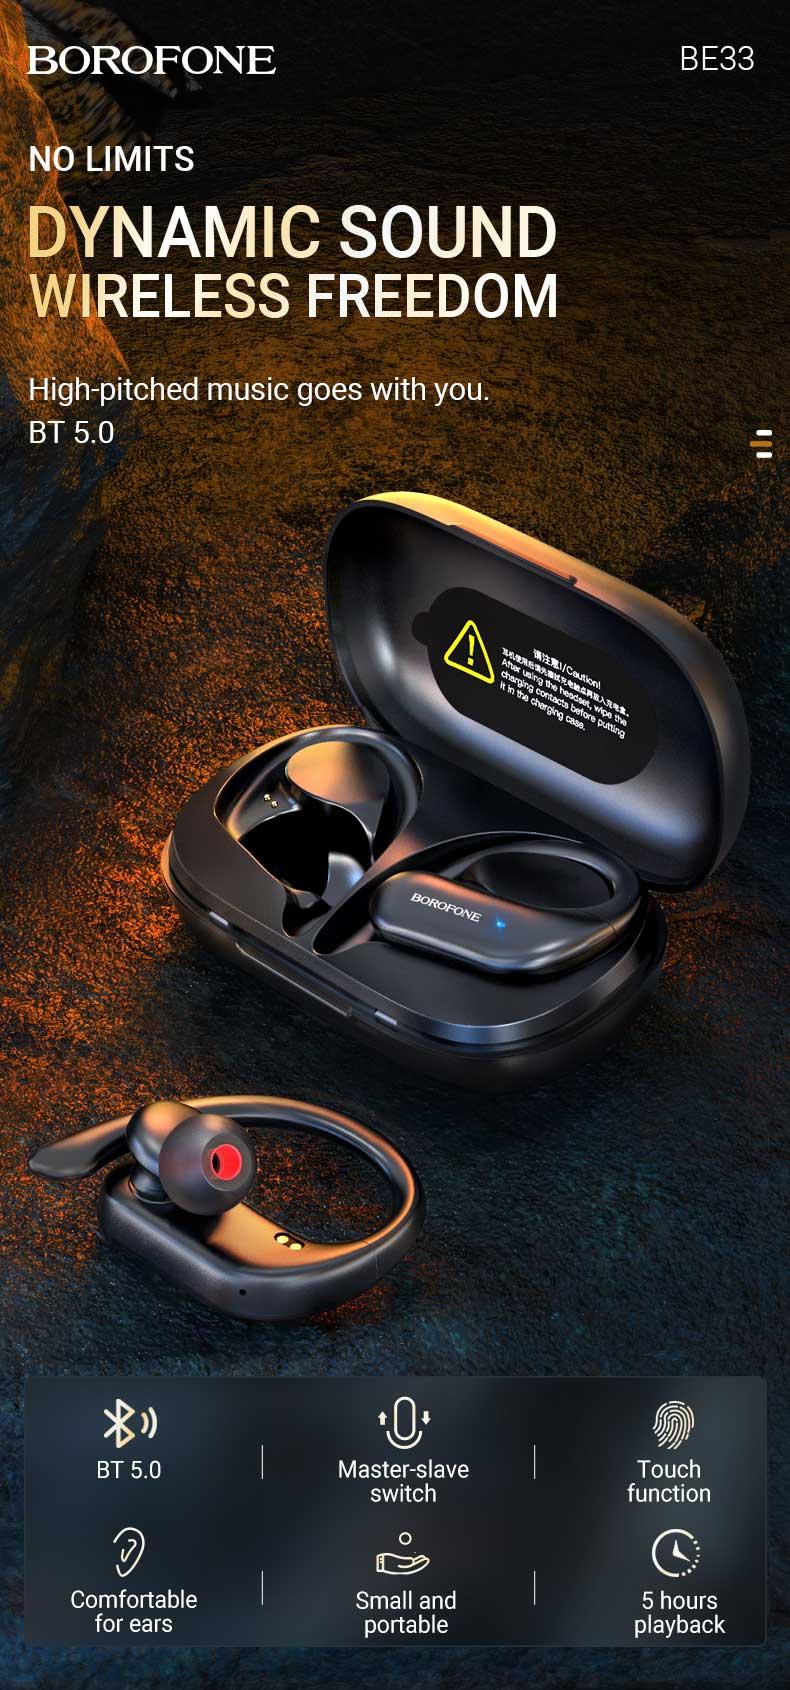 borofone news be33 rhyme tws wireless headset en